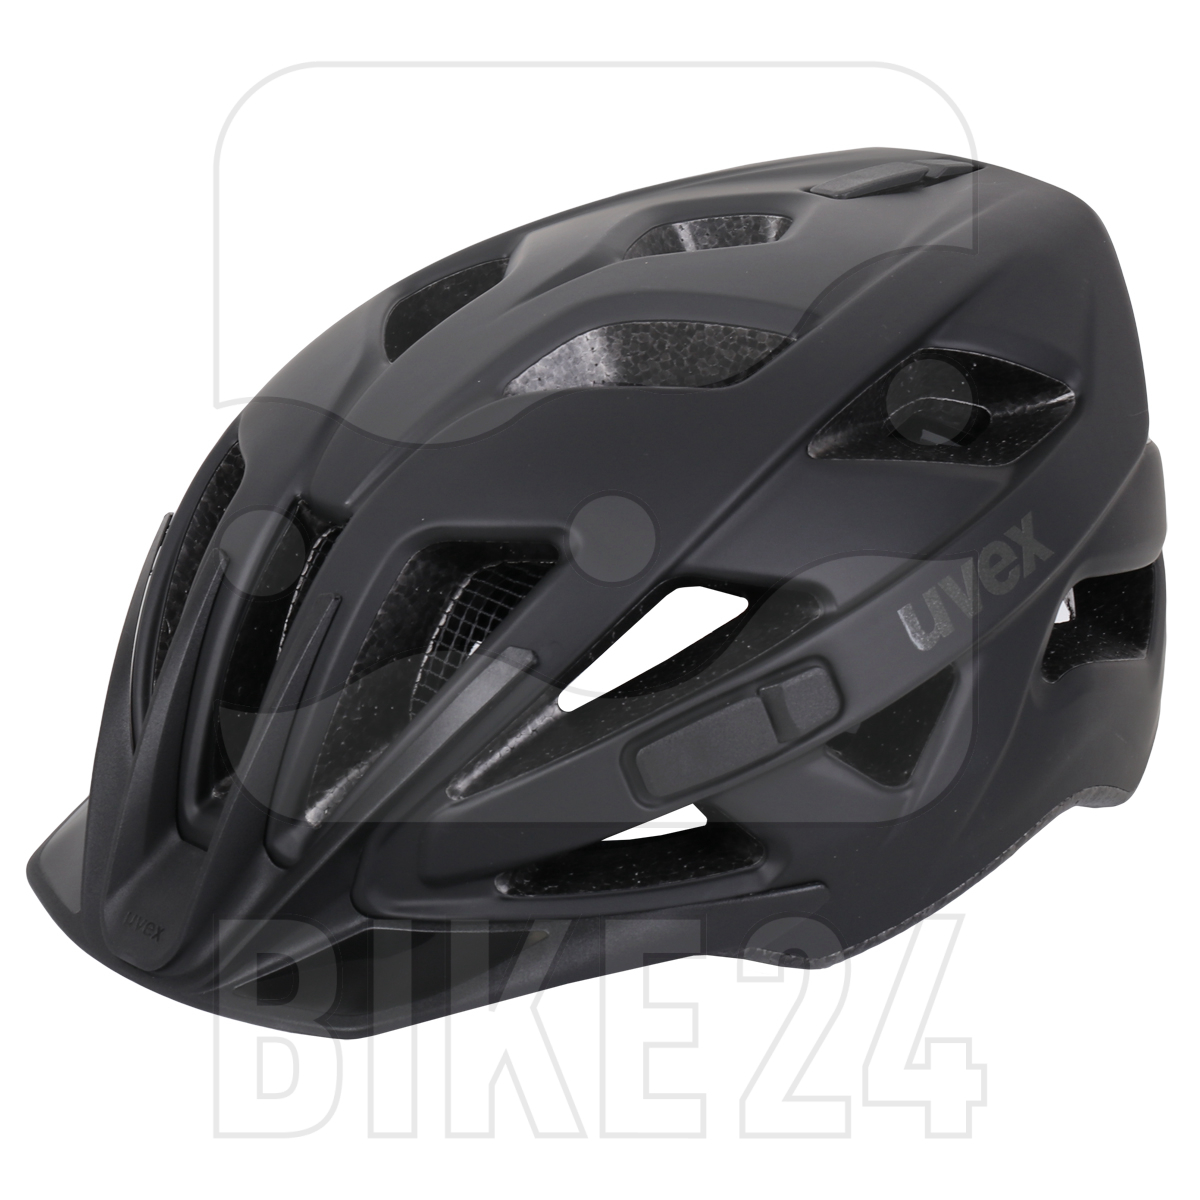 Uvex touring cc Helmet - black mat